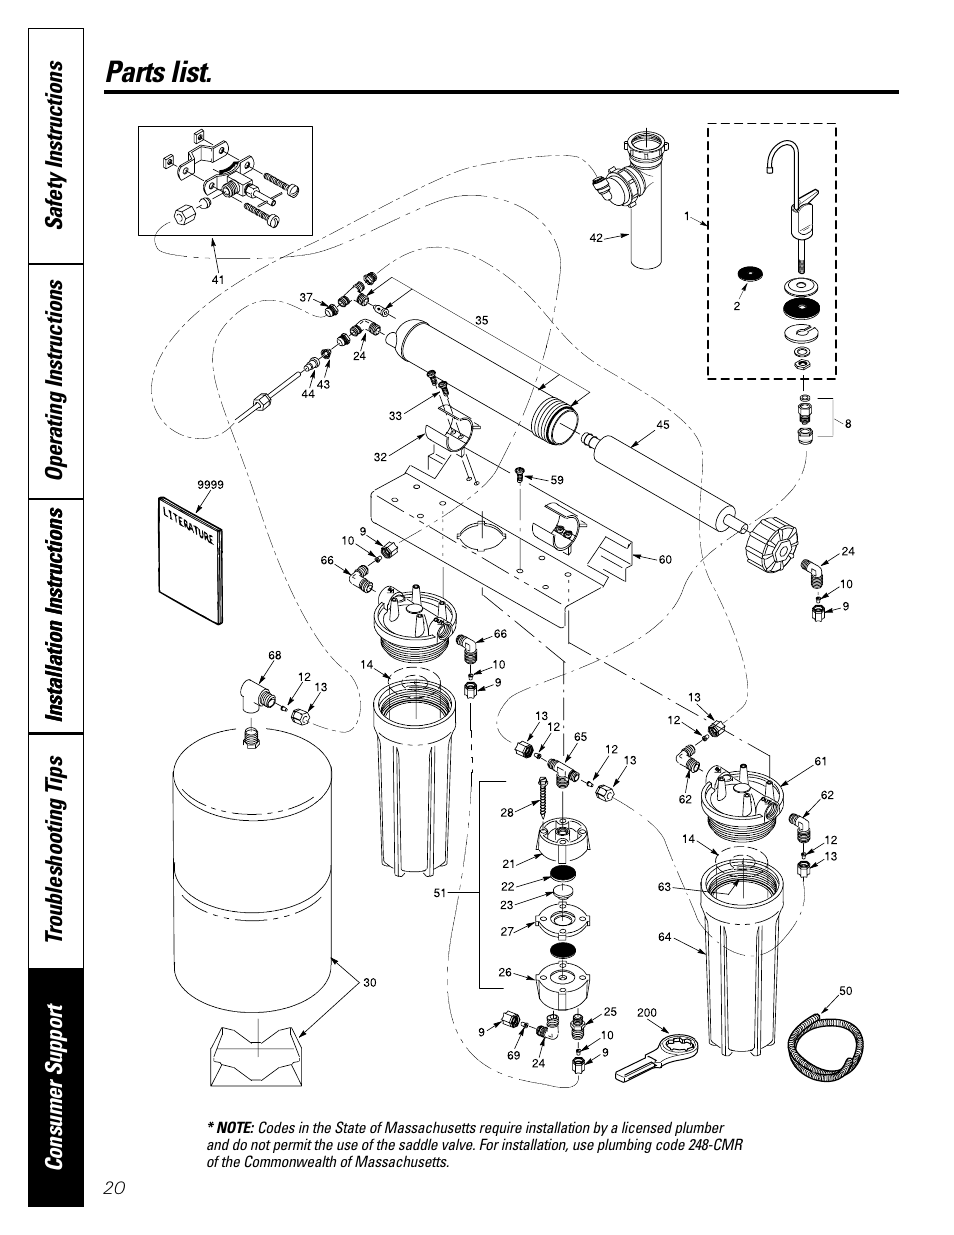 Parts list/catalog, Parts list/catalog , 21, Parts list